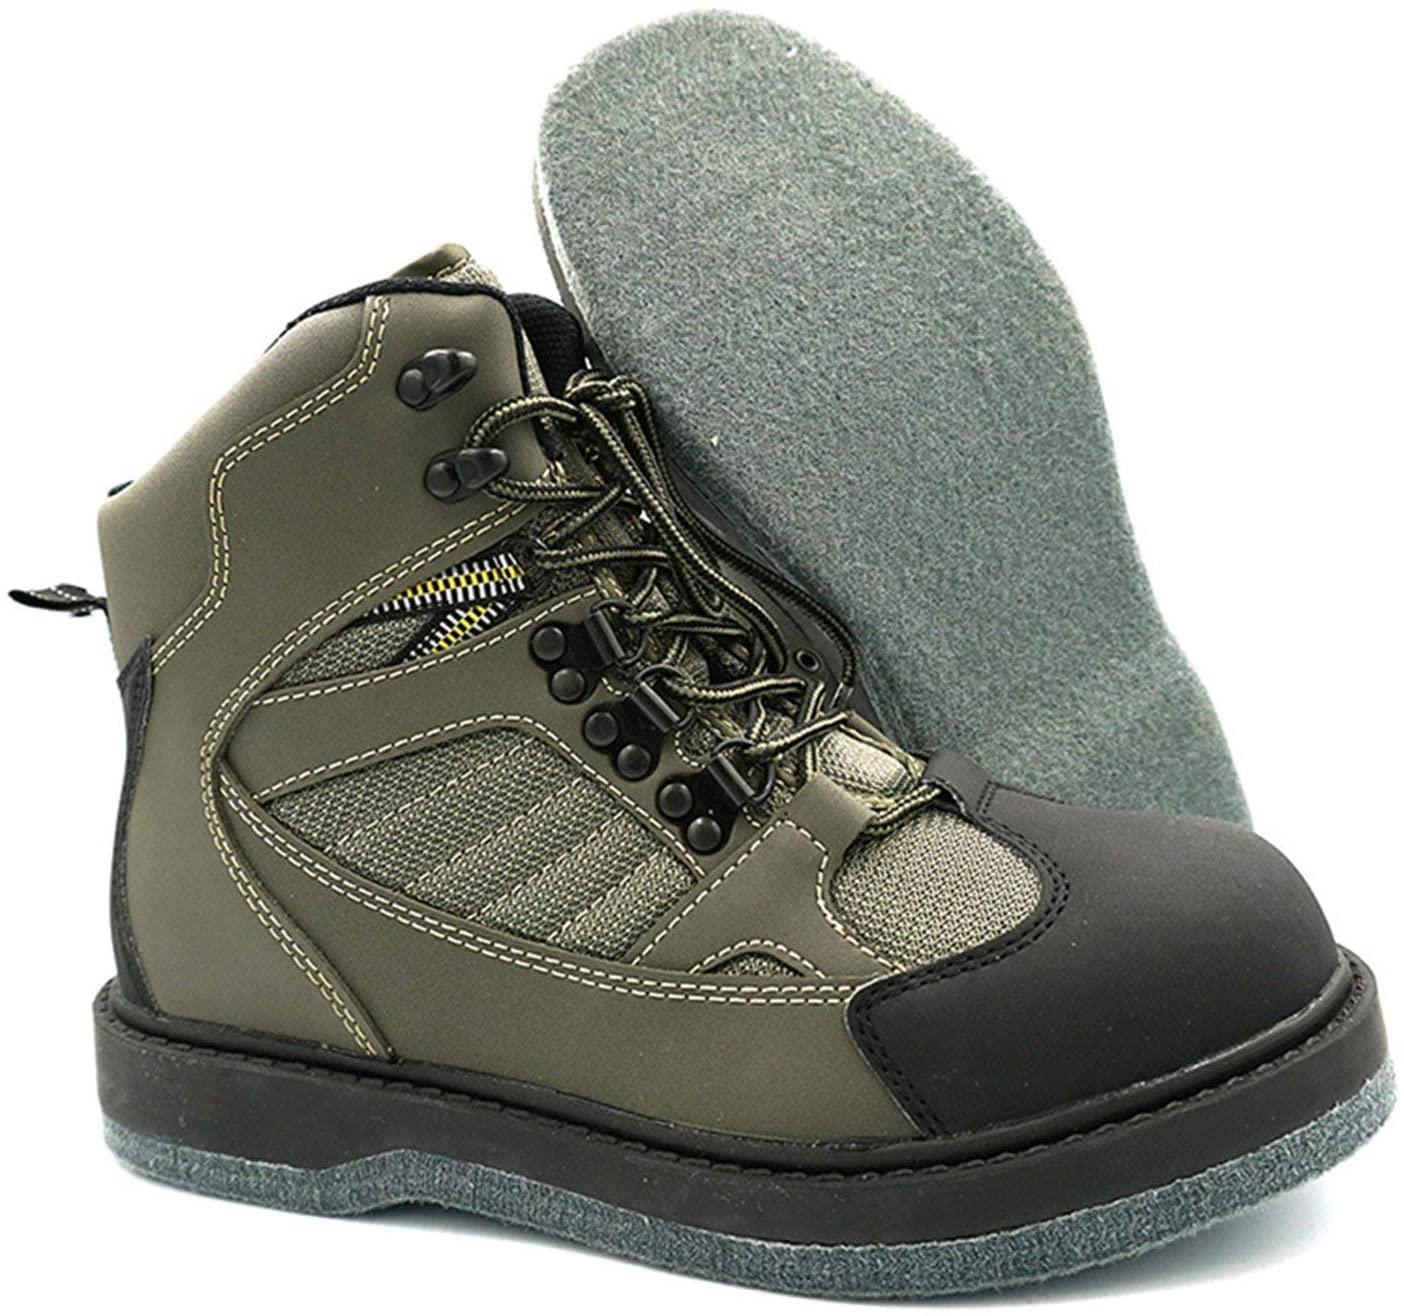 Felt sole saltwater boots